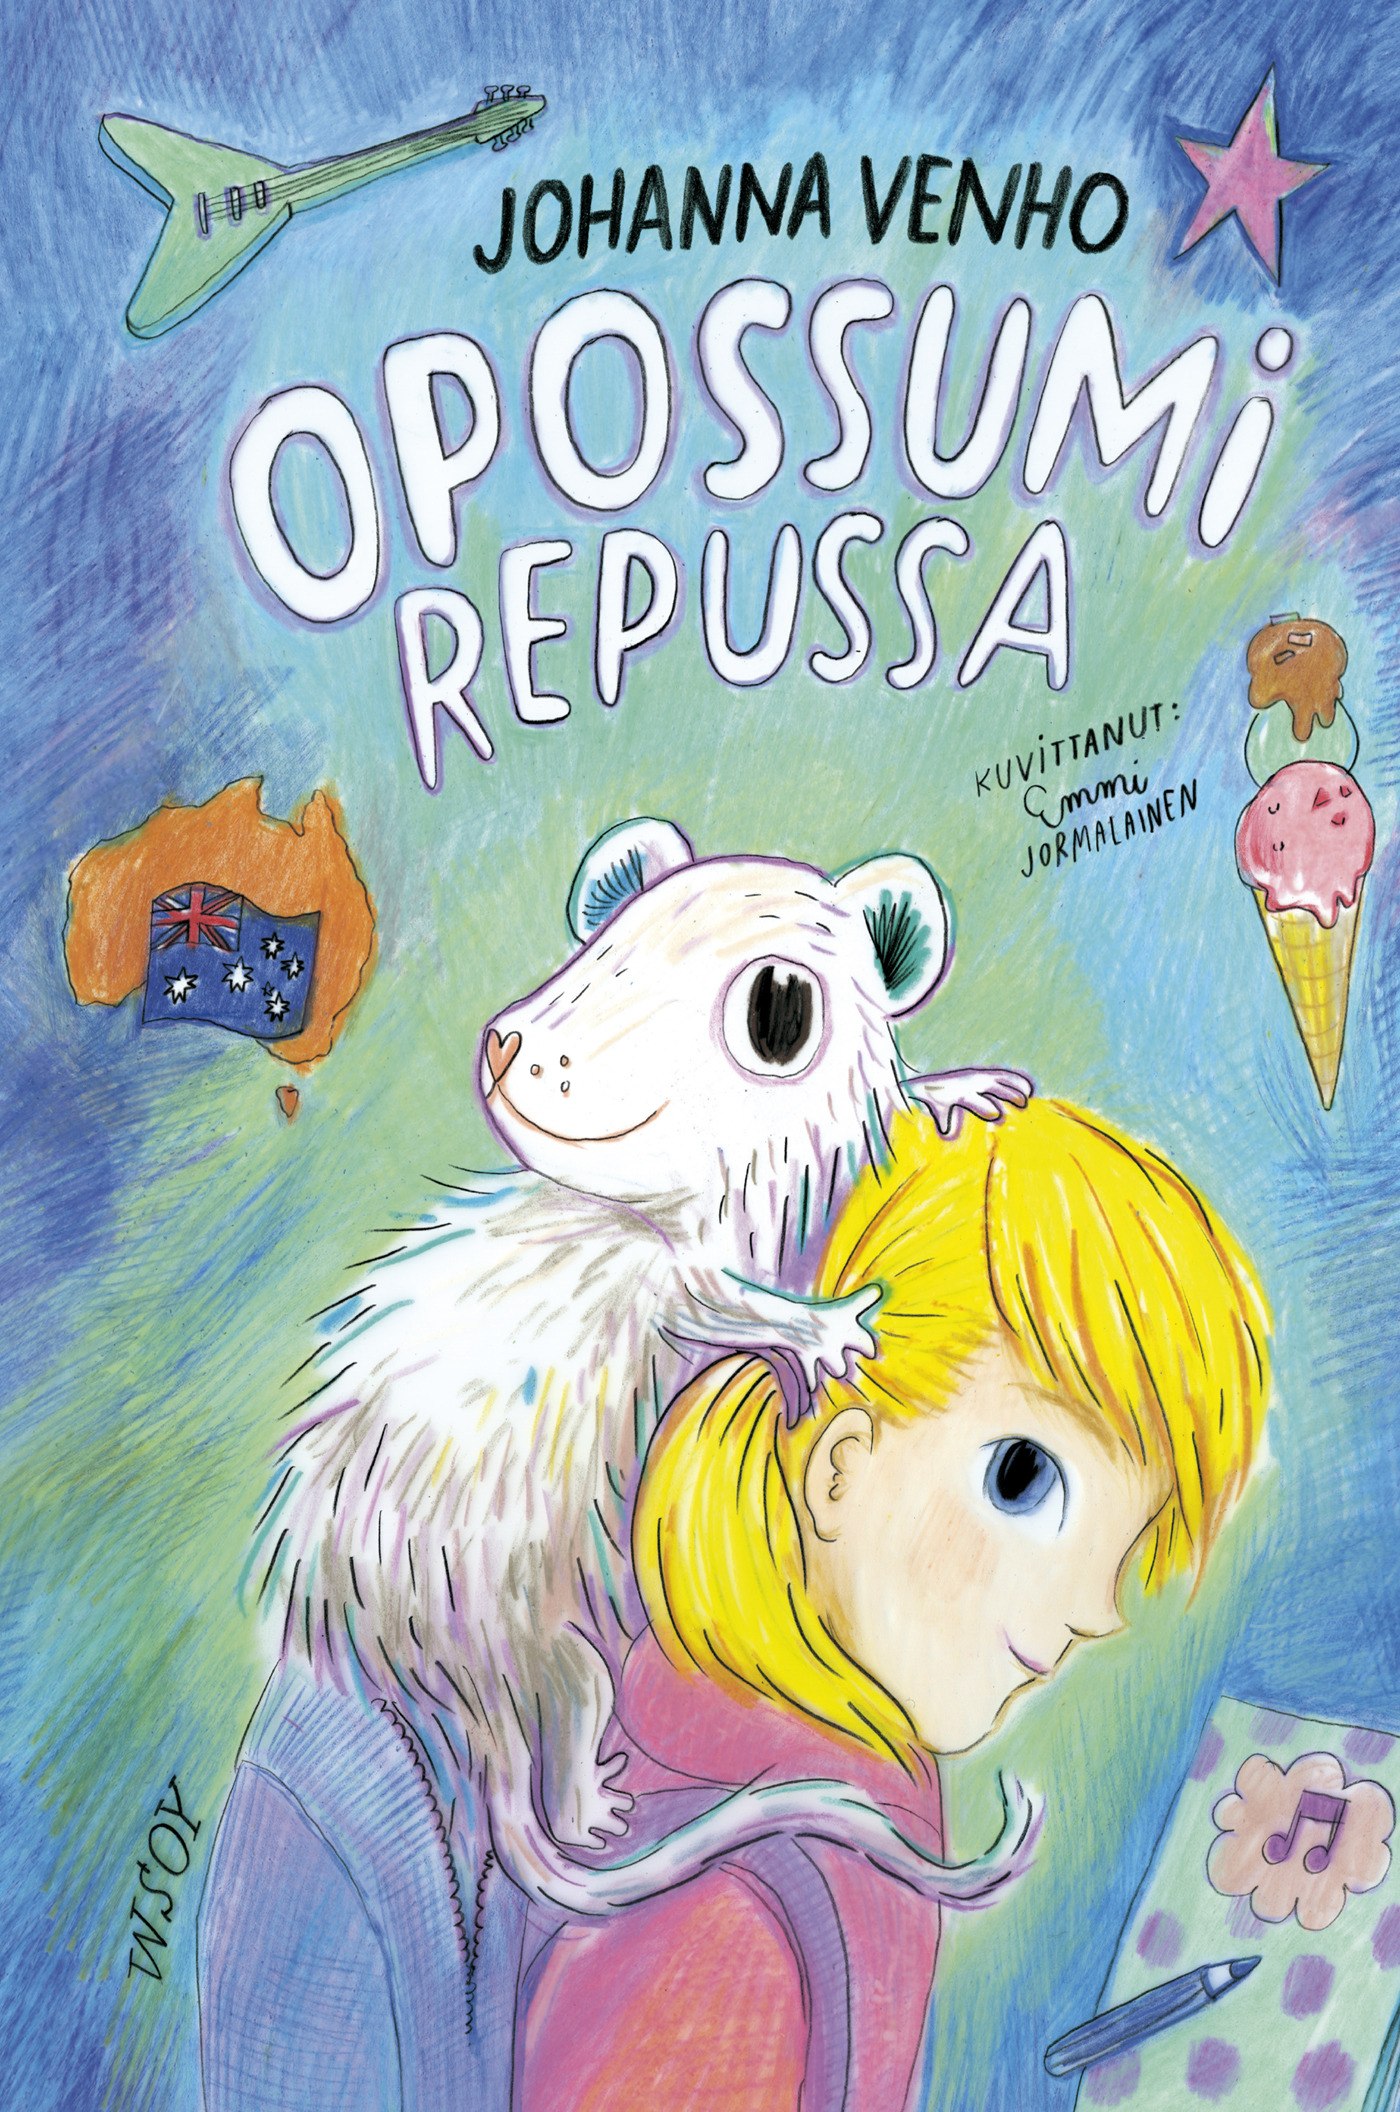 Venho, Johanna - Opossumi repussa, e-kirja